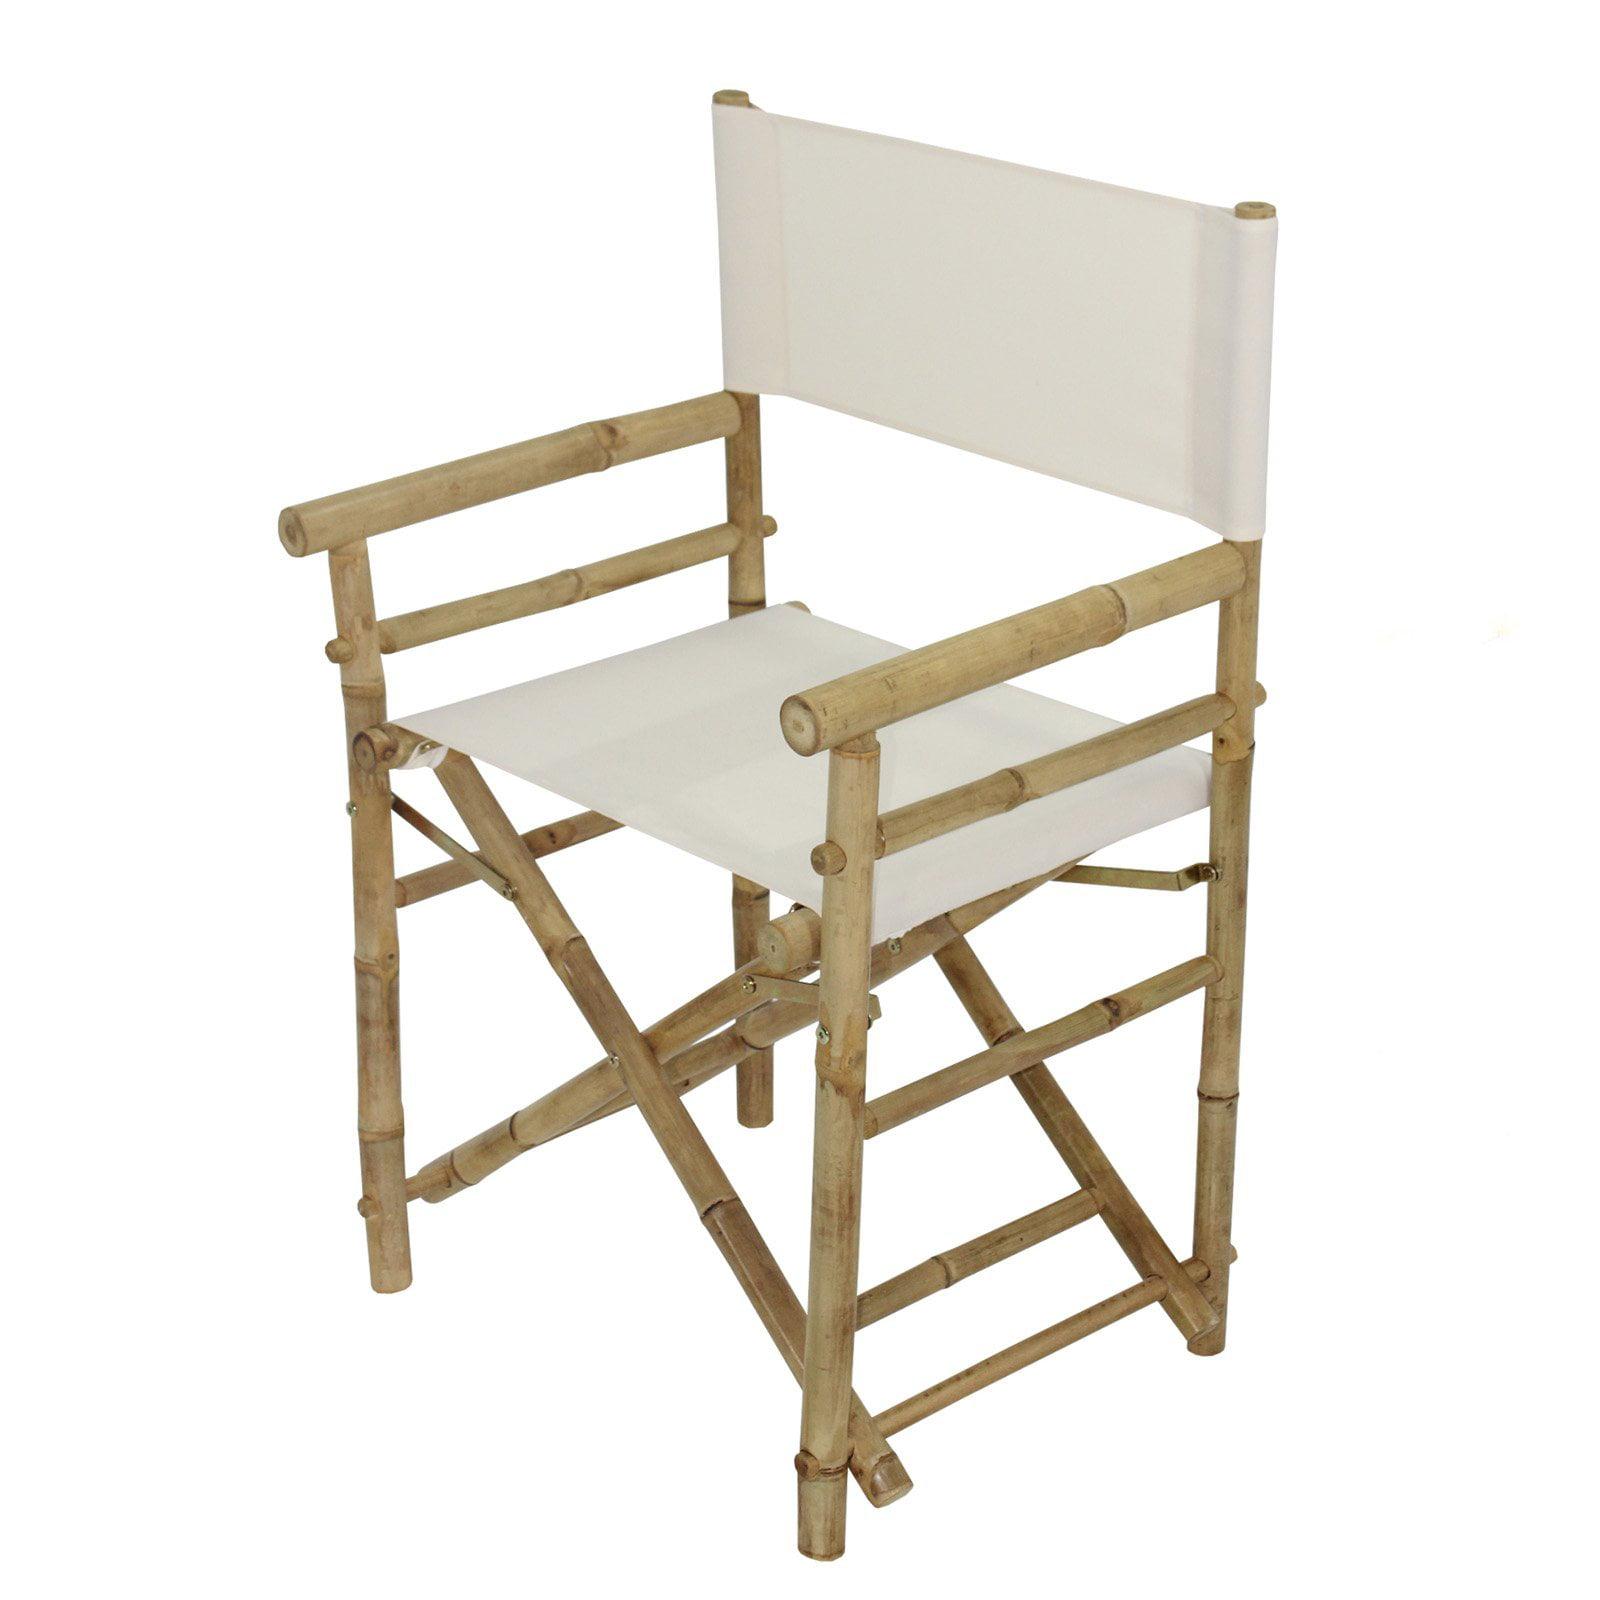 Statra Bamboo Indoor Outdoor Canvas Director Chair - Set of 2